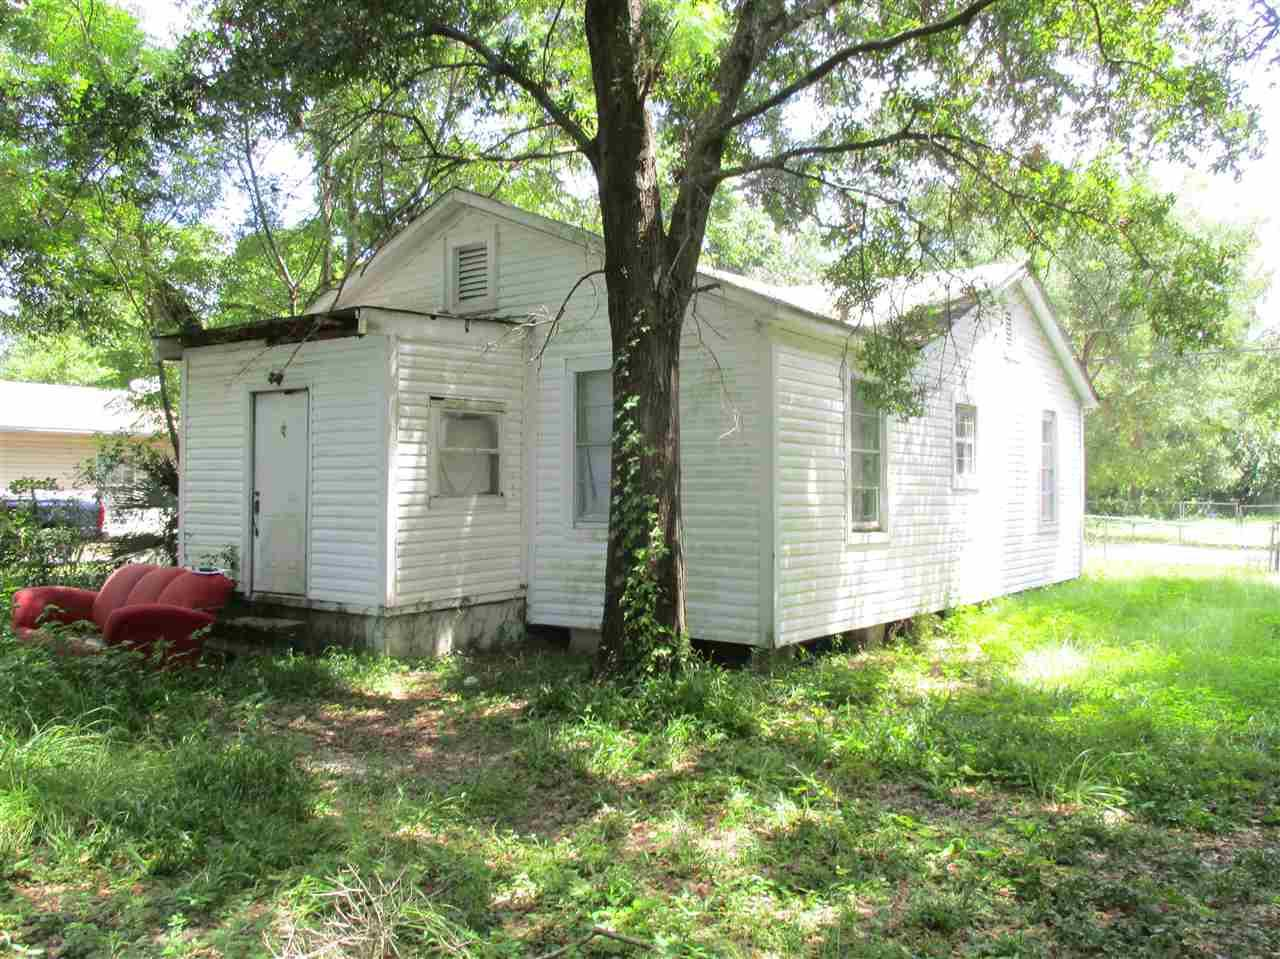 3001 N Miller St, Pensacola, FL 32503